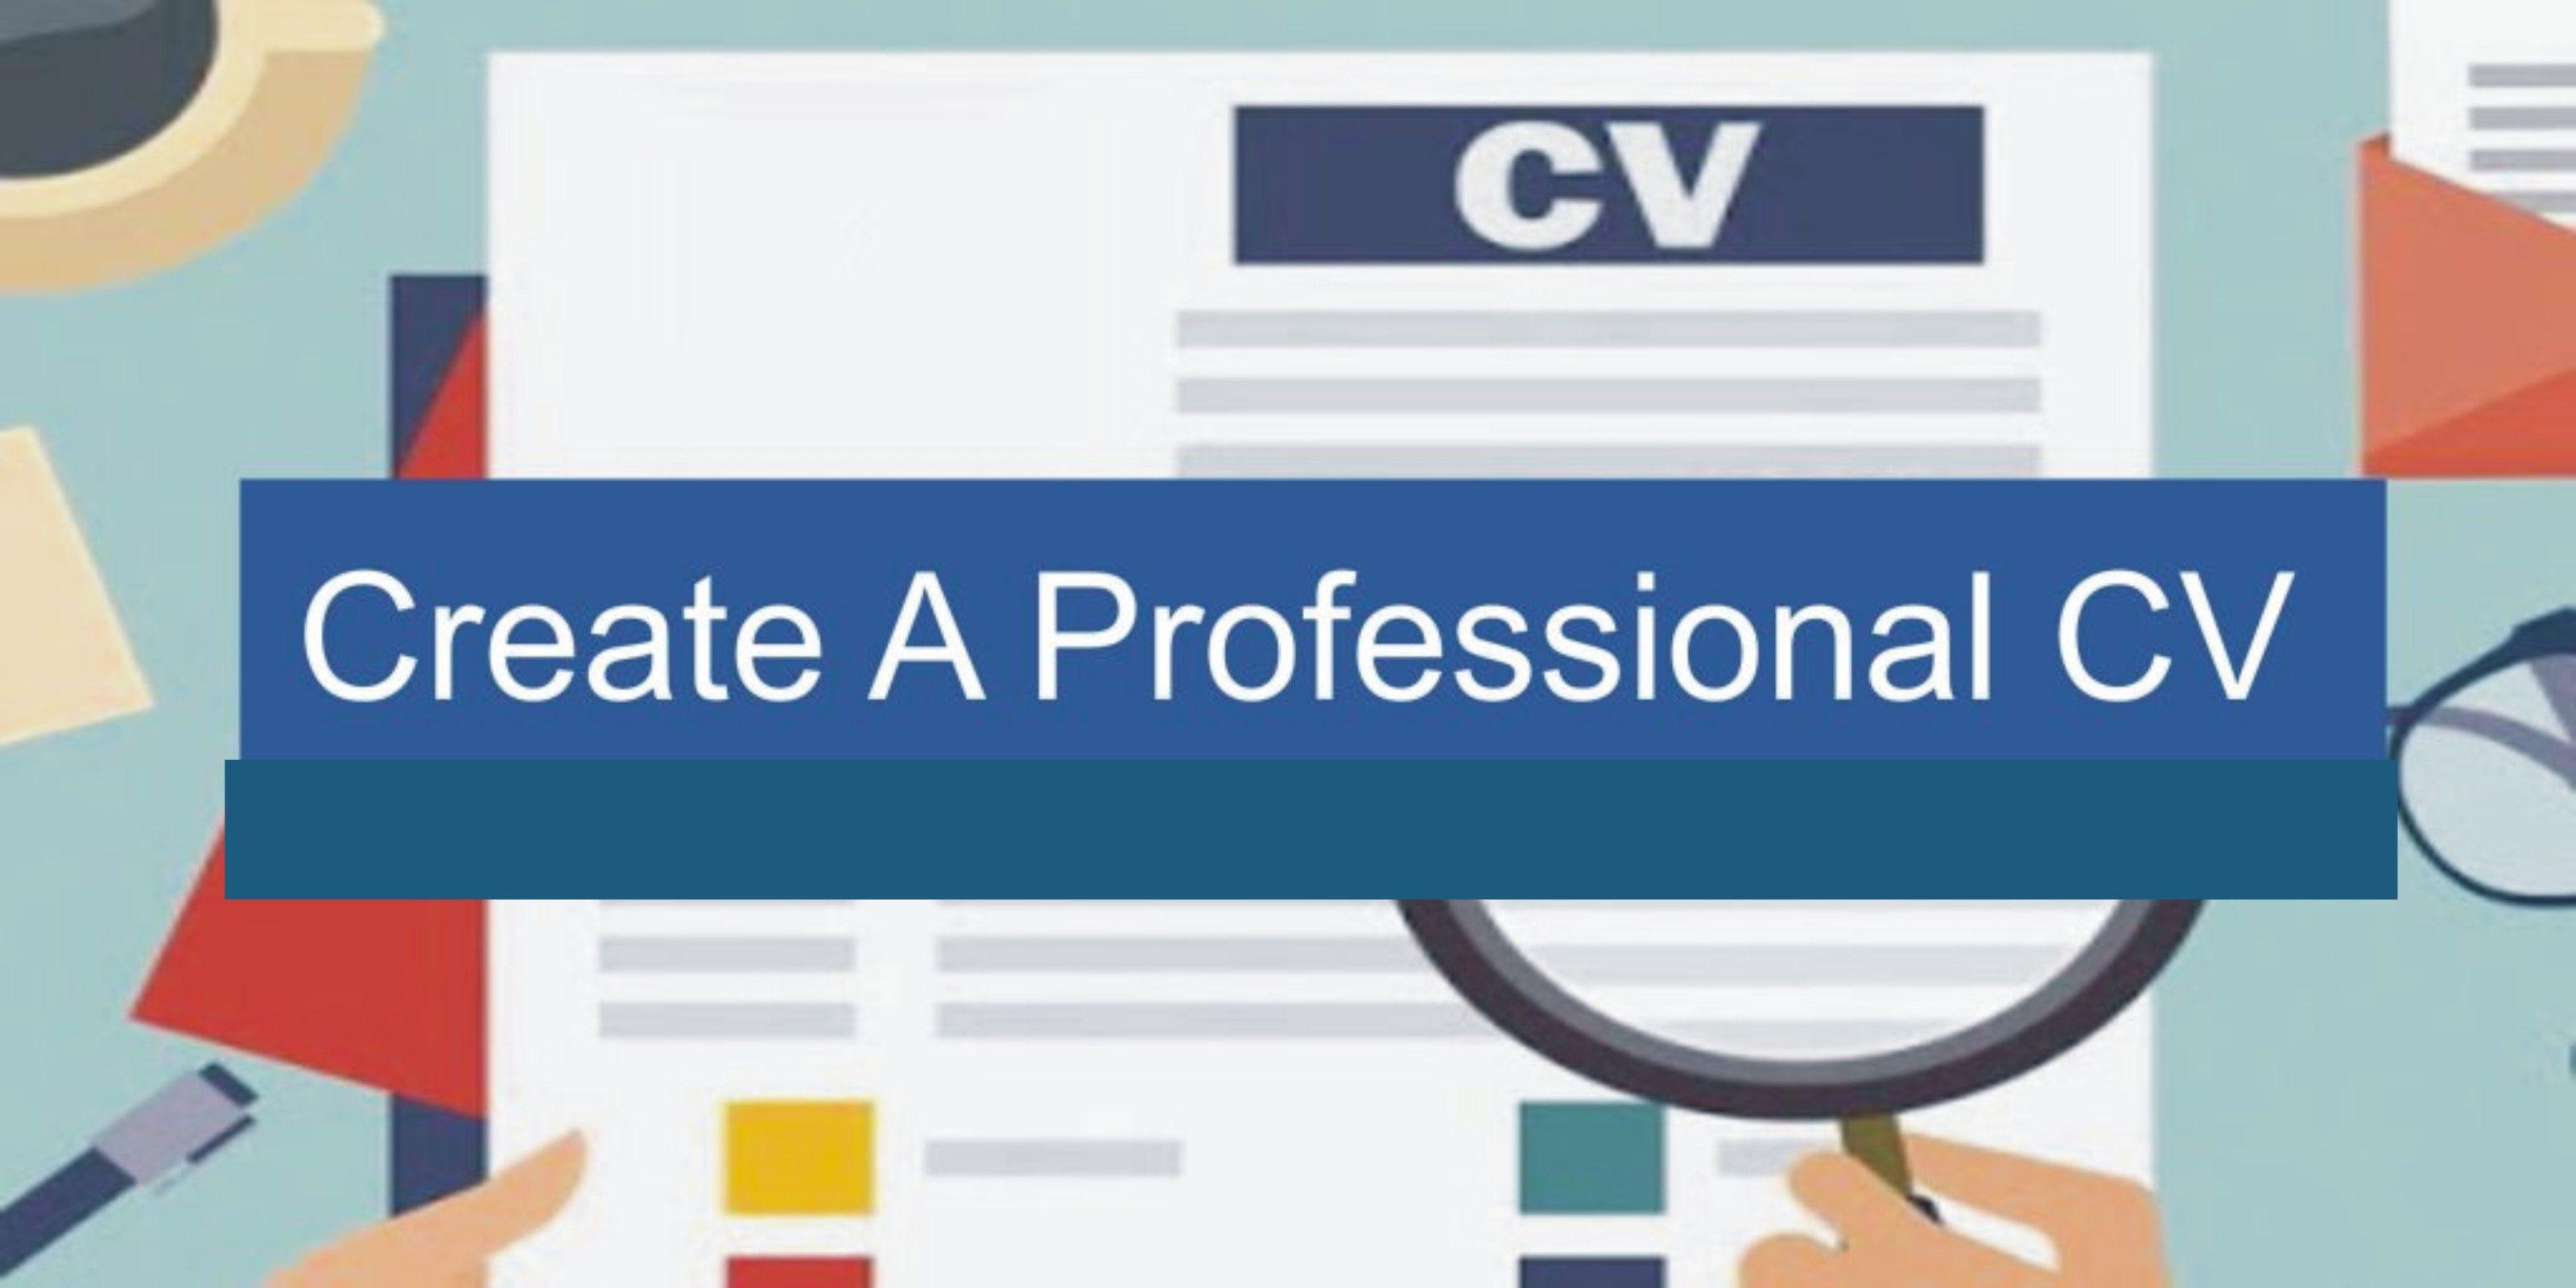 How to create a professional cv professional cv